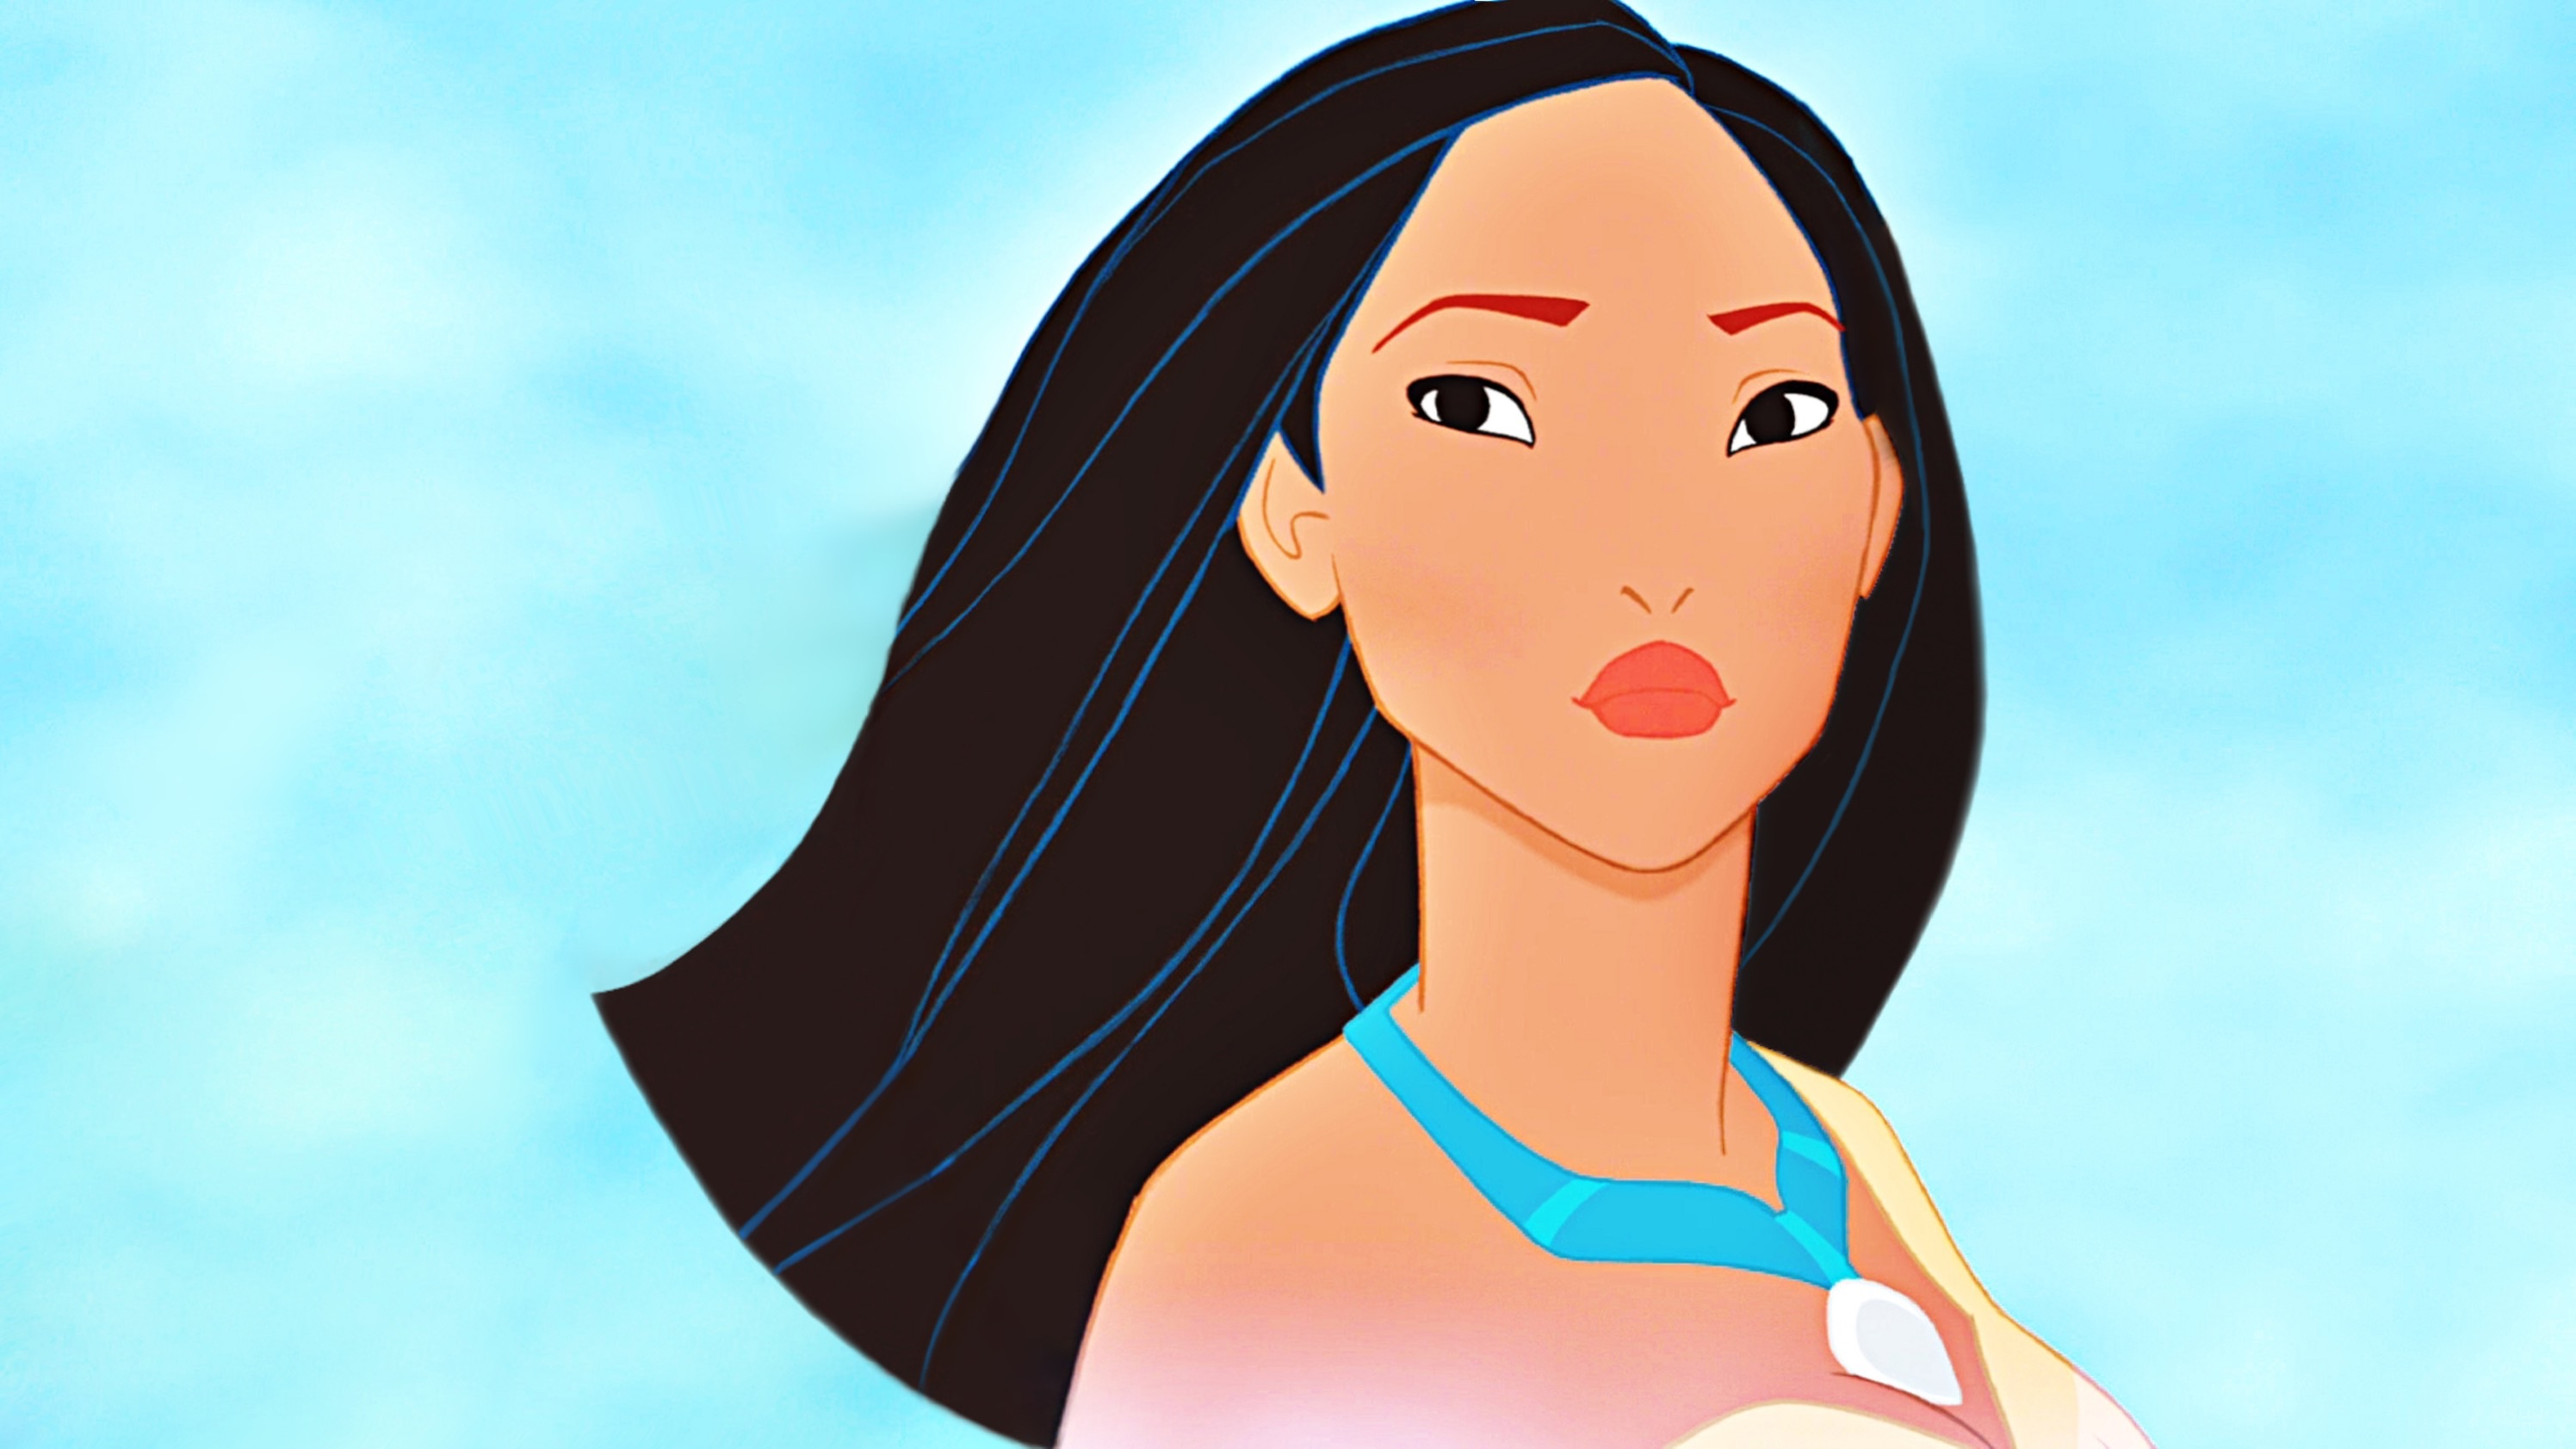 Walt Disney Images Pocahontas With Short Hair Disney Princess Fan Art 38781027 Fanpop